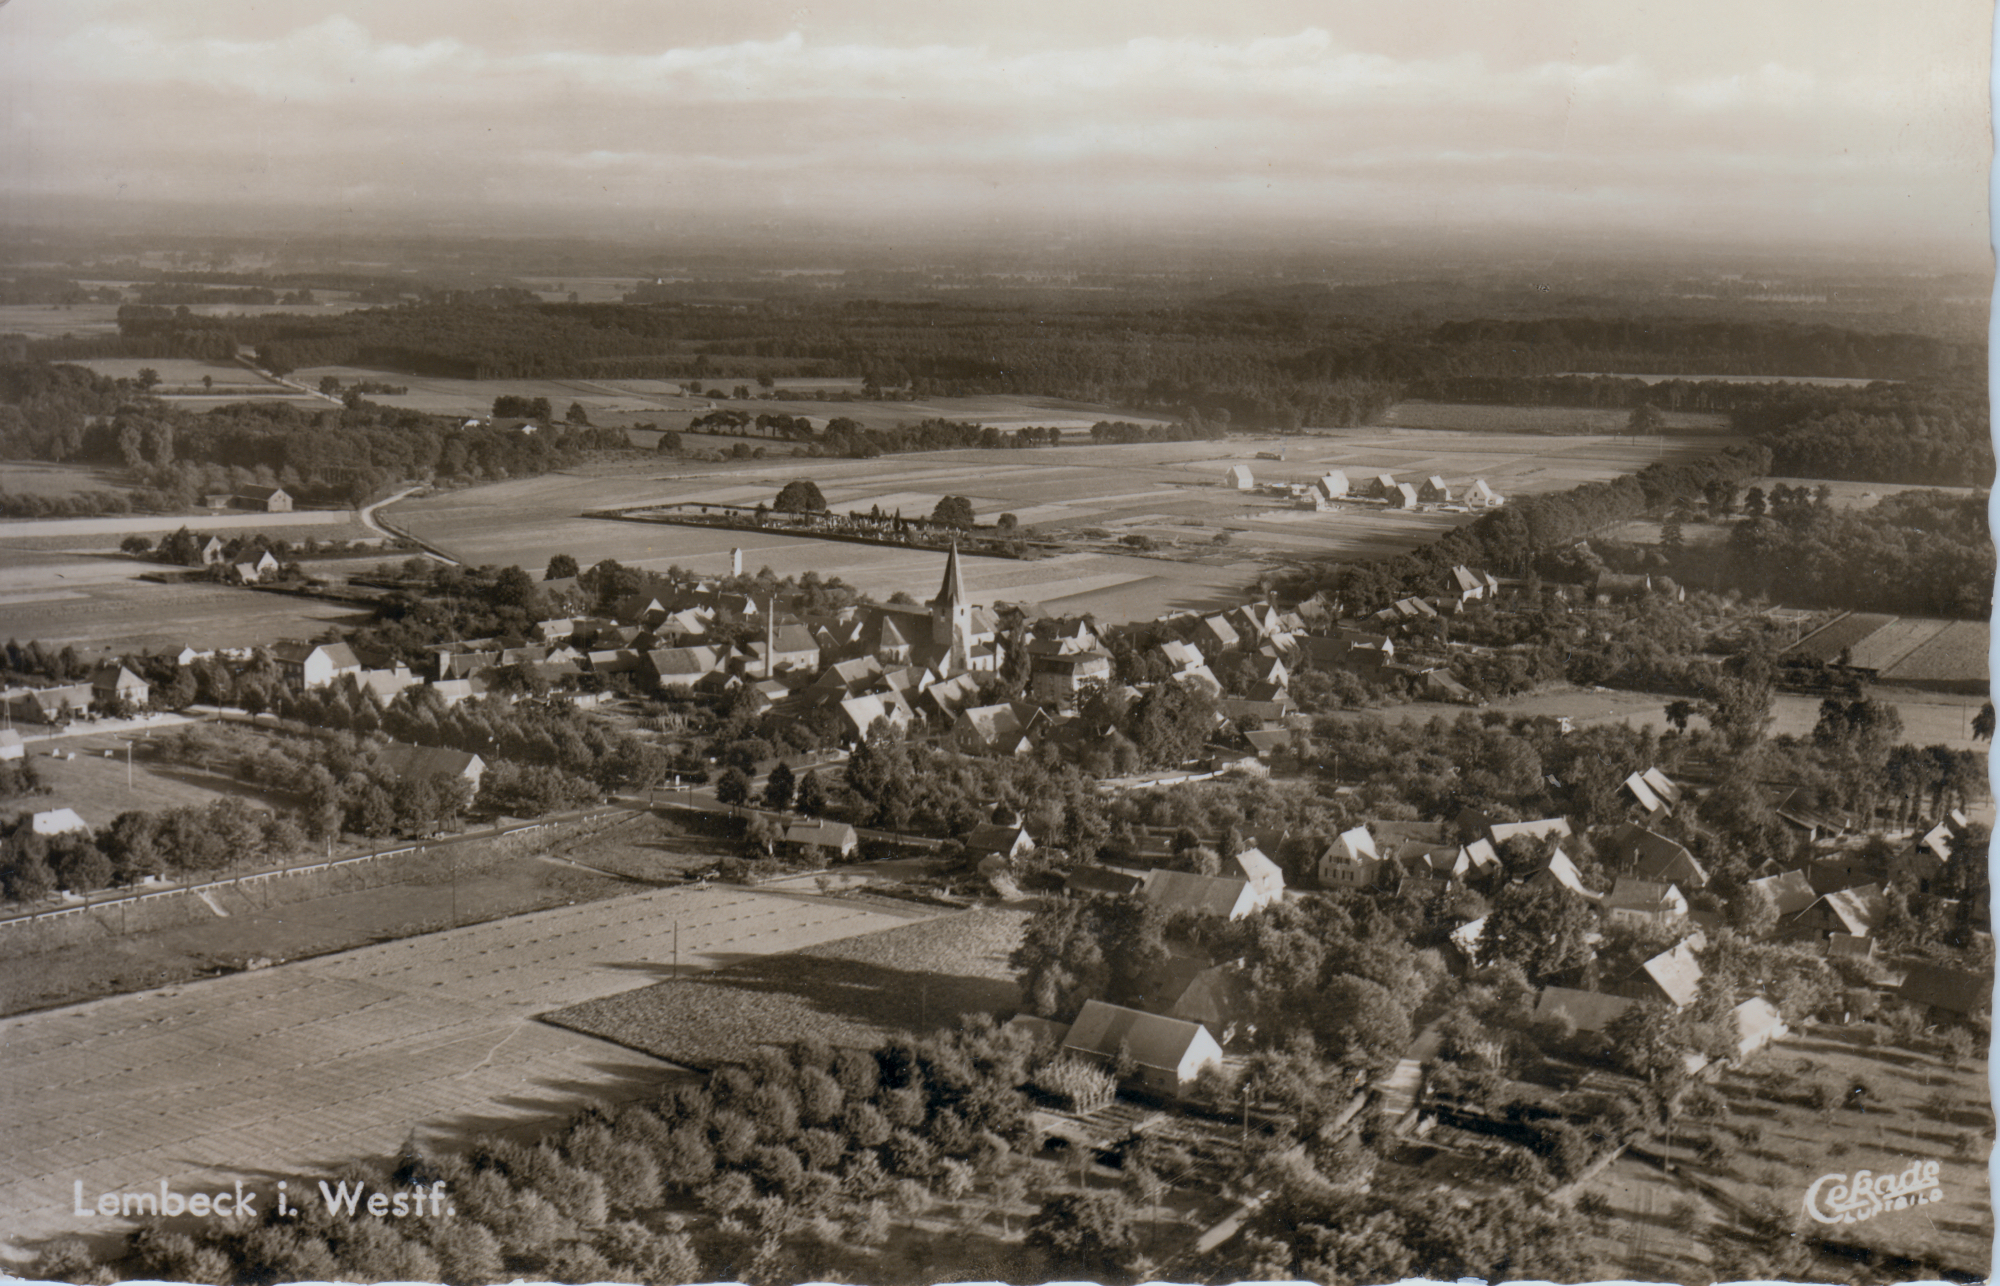 Luftbild, Lembeck